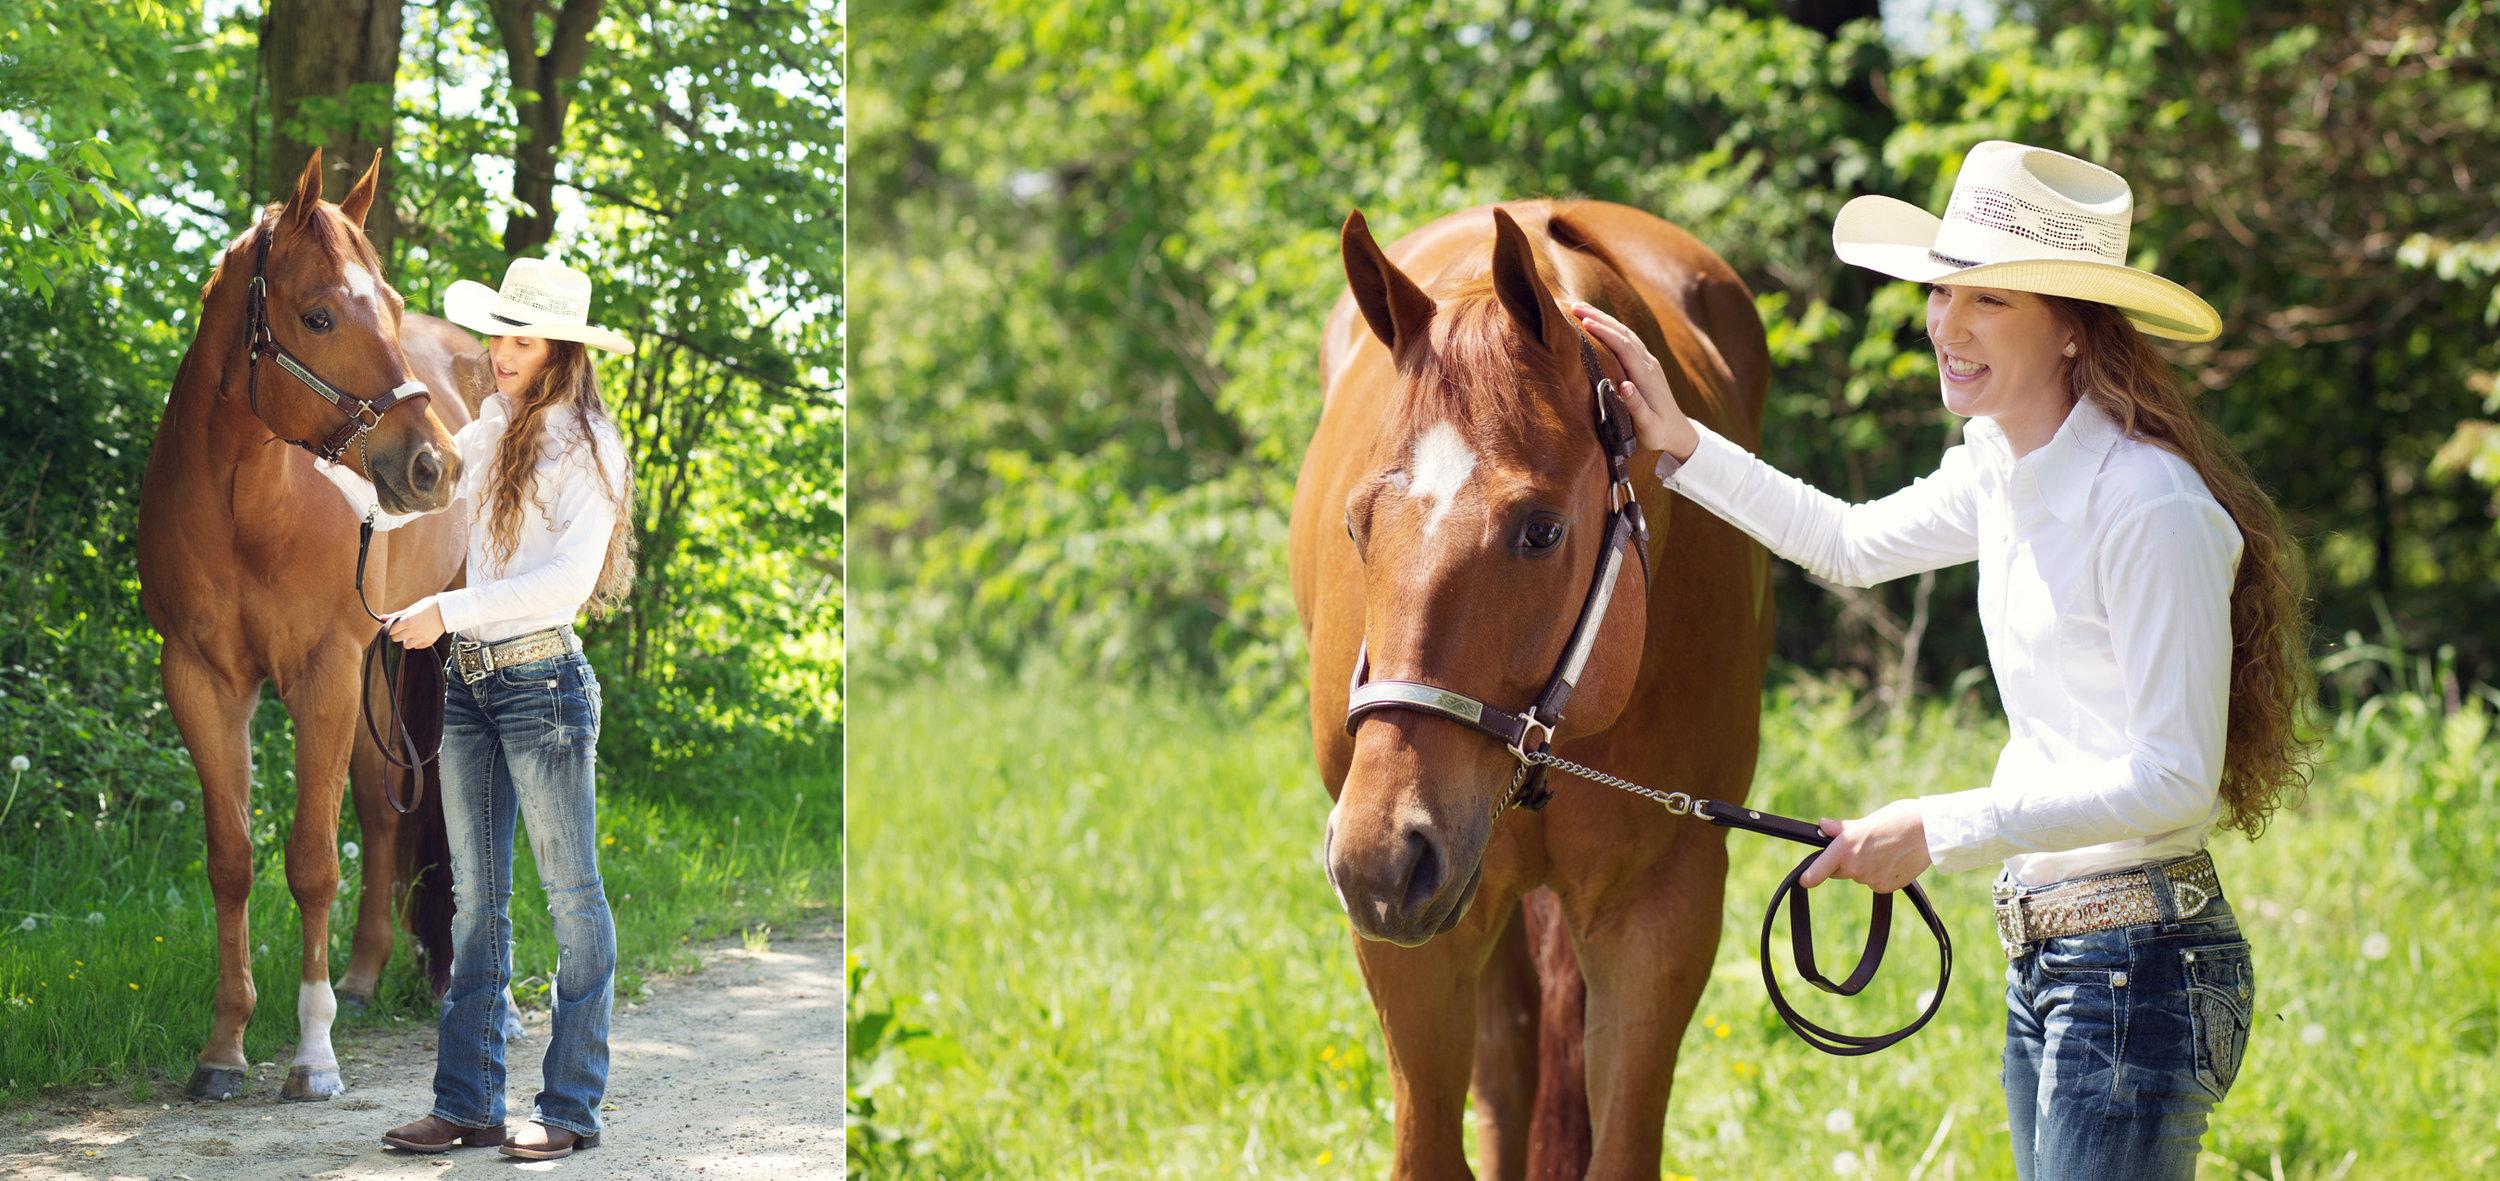 Senior with Horse | Kelly Rhoades Photography